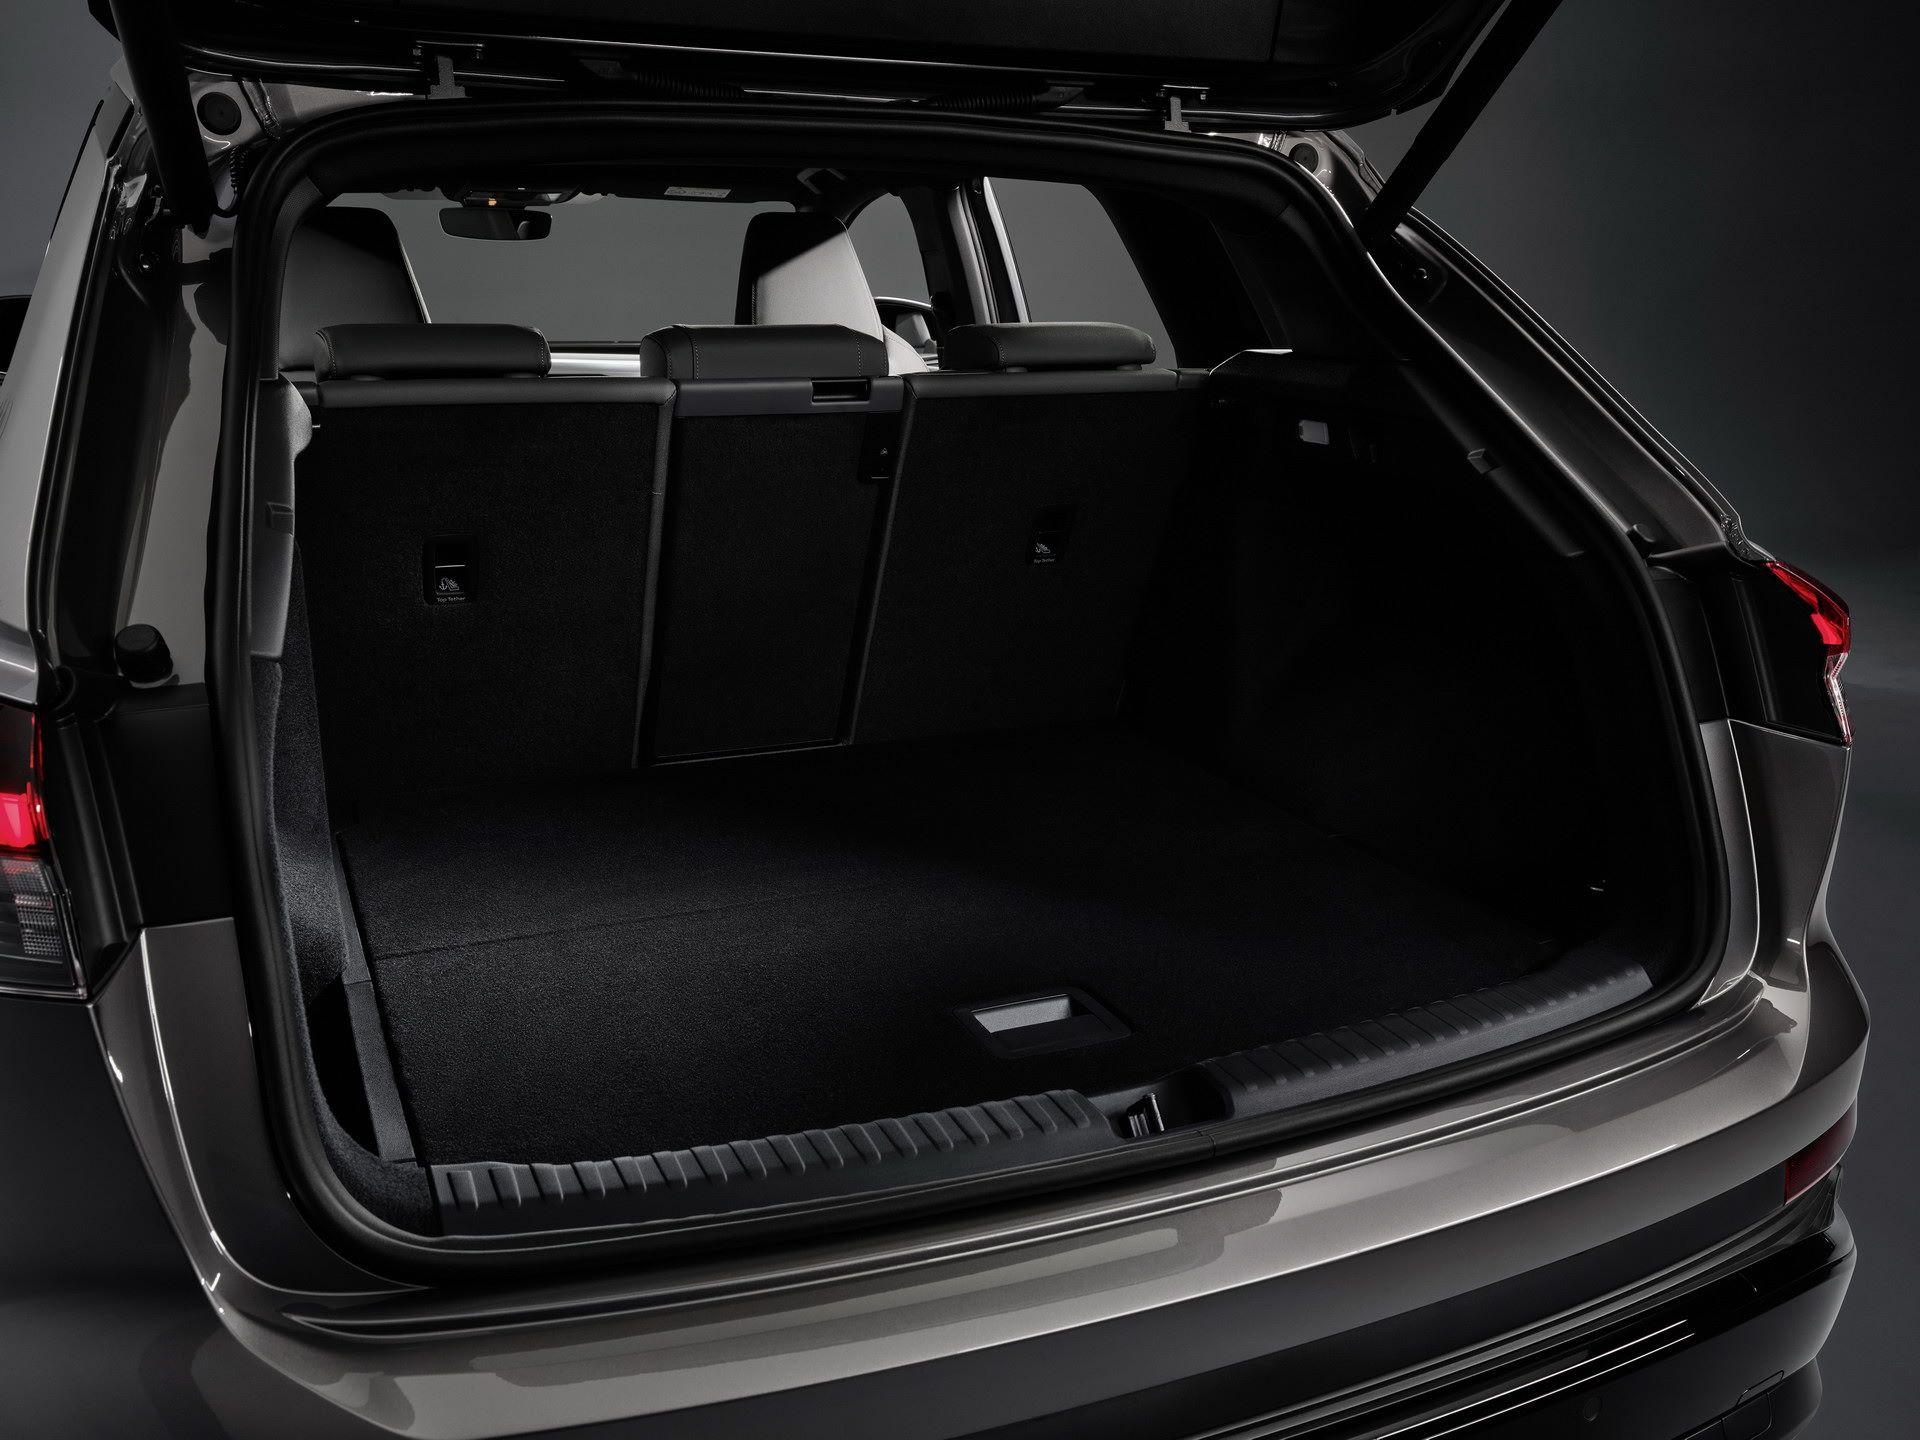 Audi-Q4-e-tron-and-Q4-e-tron-Sportback-82